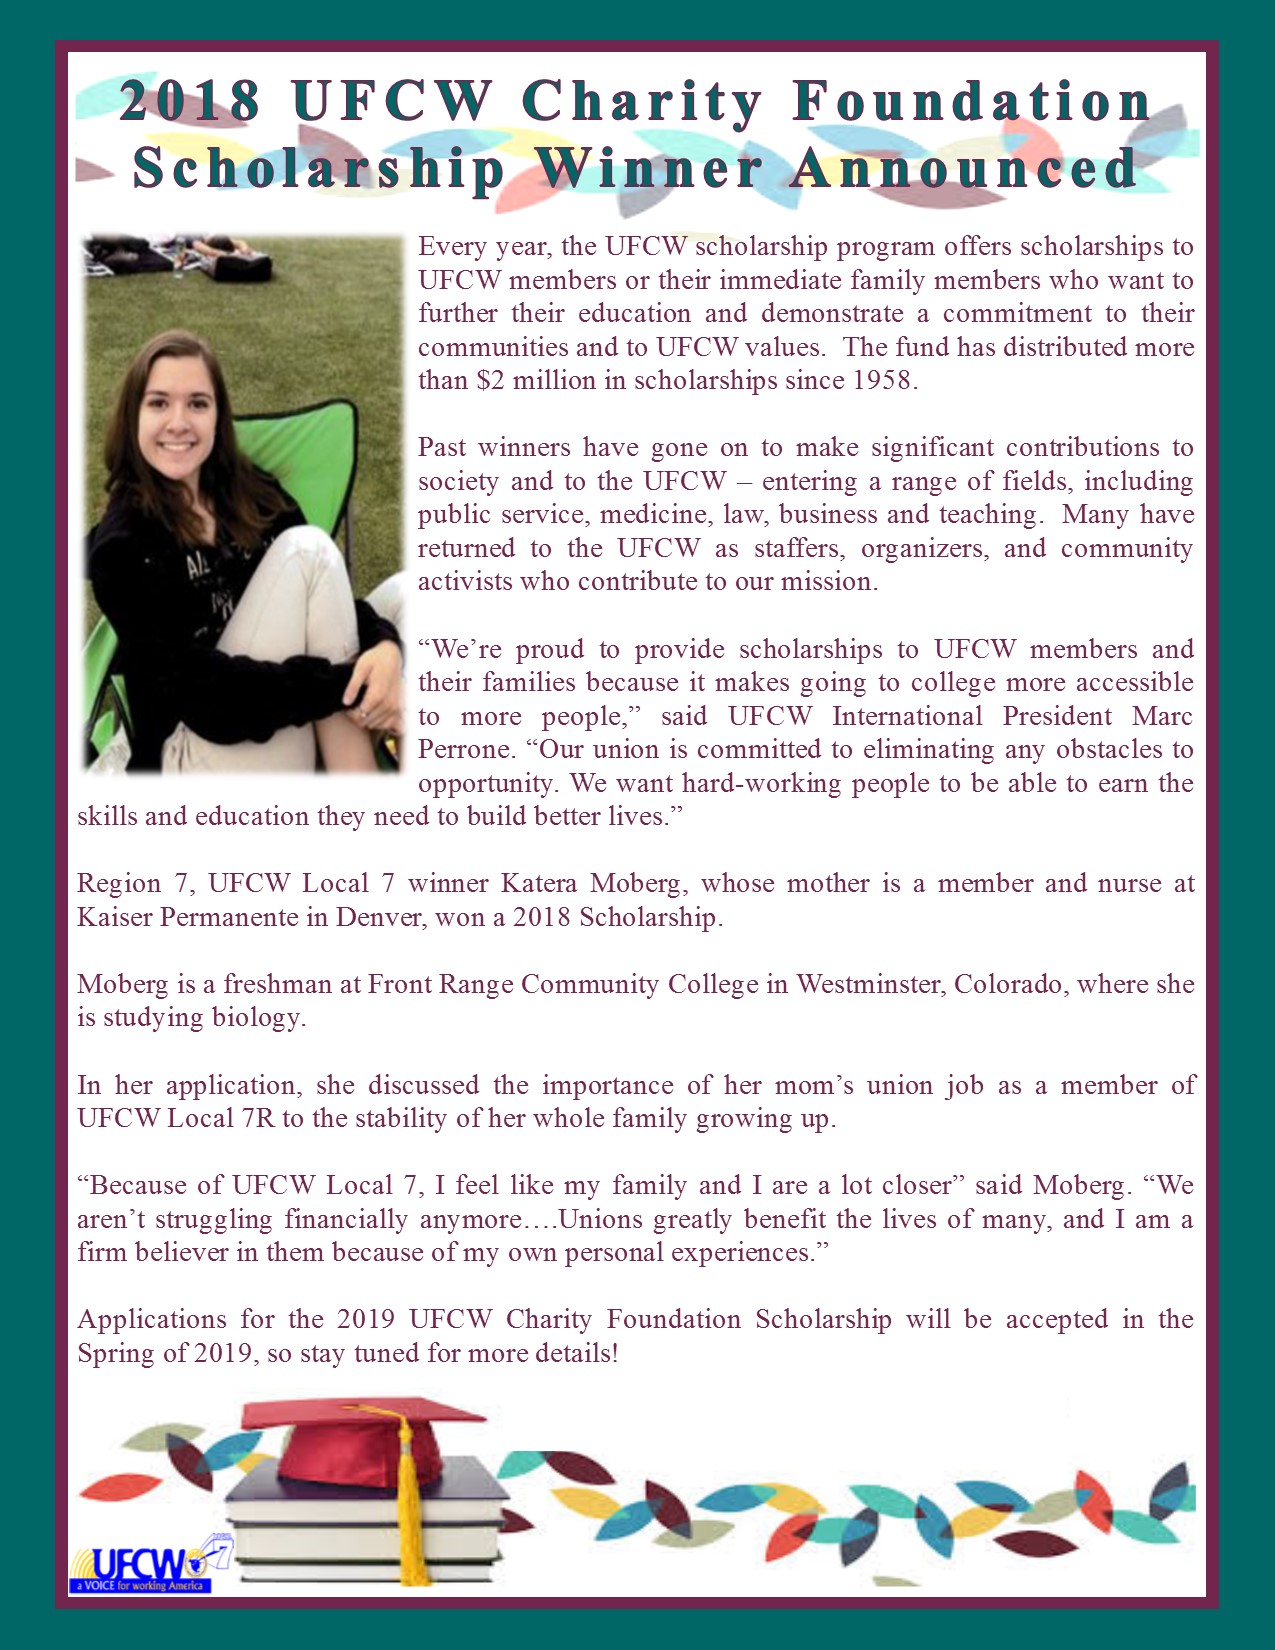 UFCW Charity Foundation Scholarship Winner